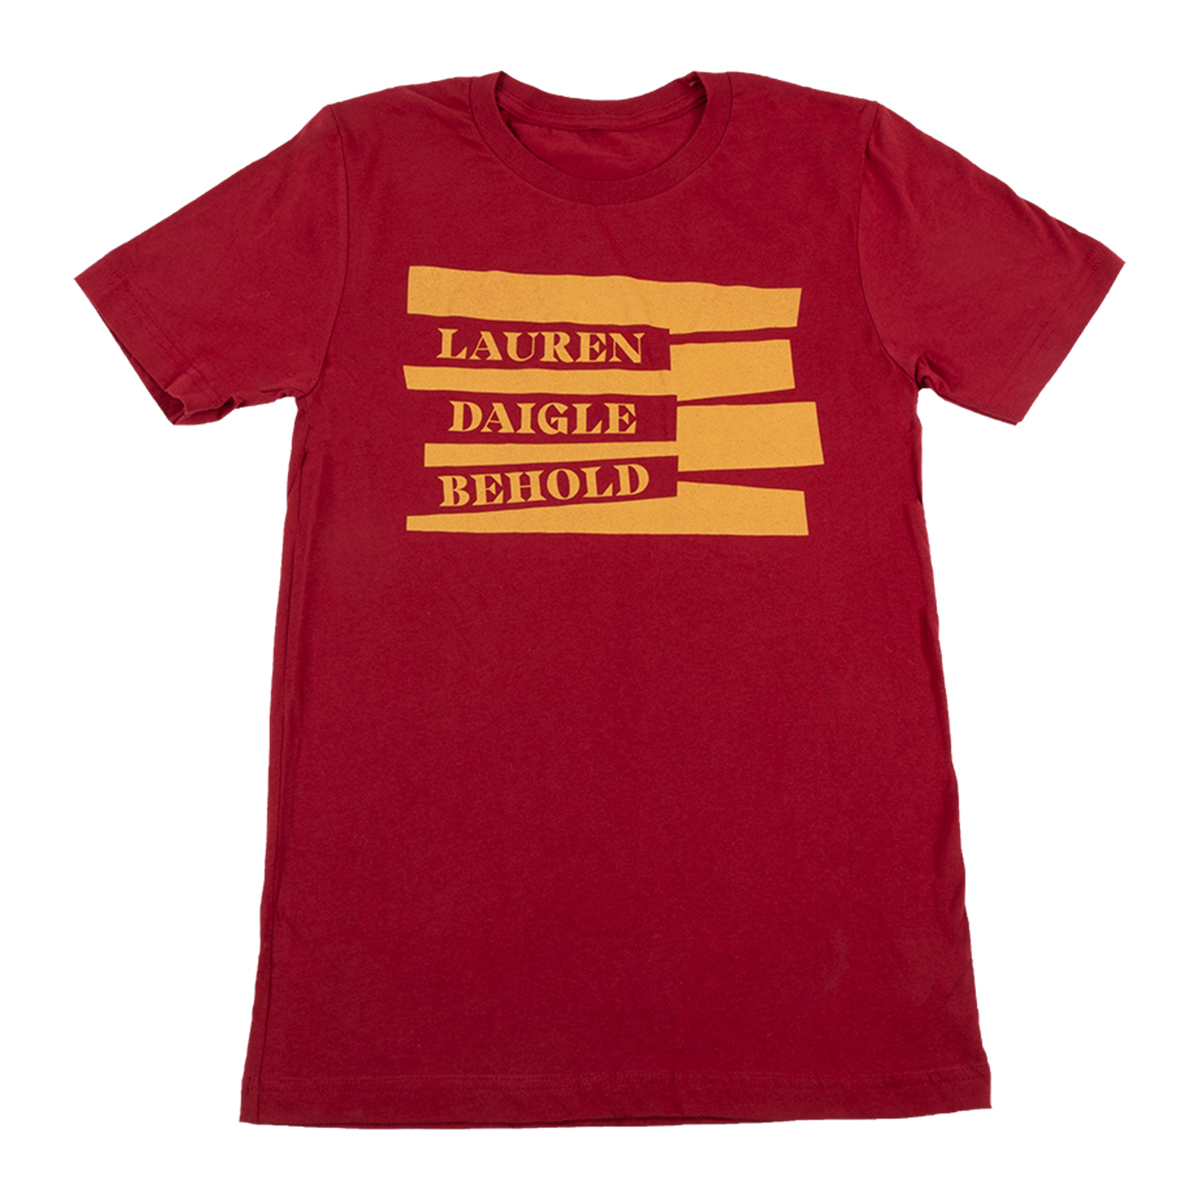 Behold Keys T-shirt